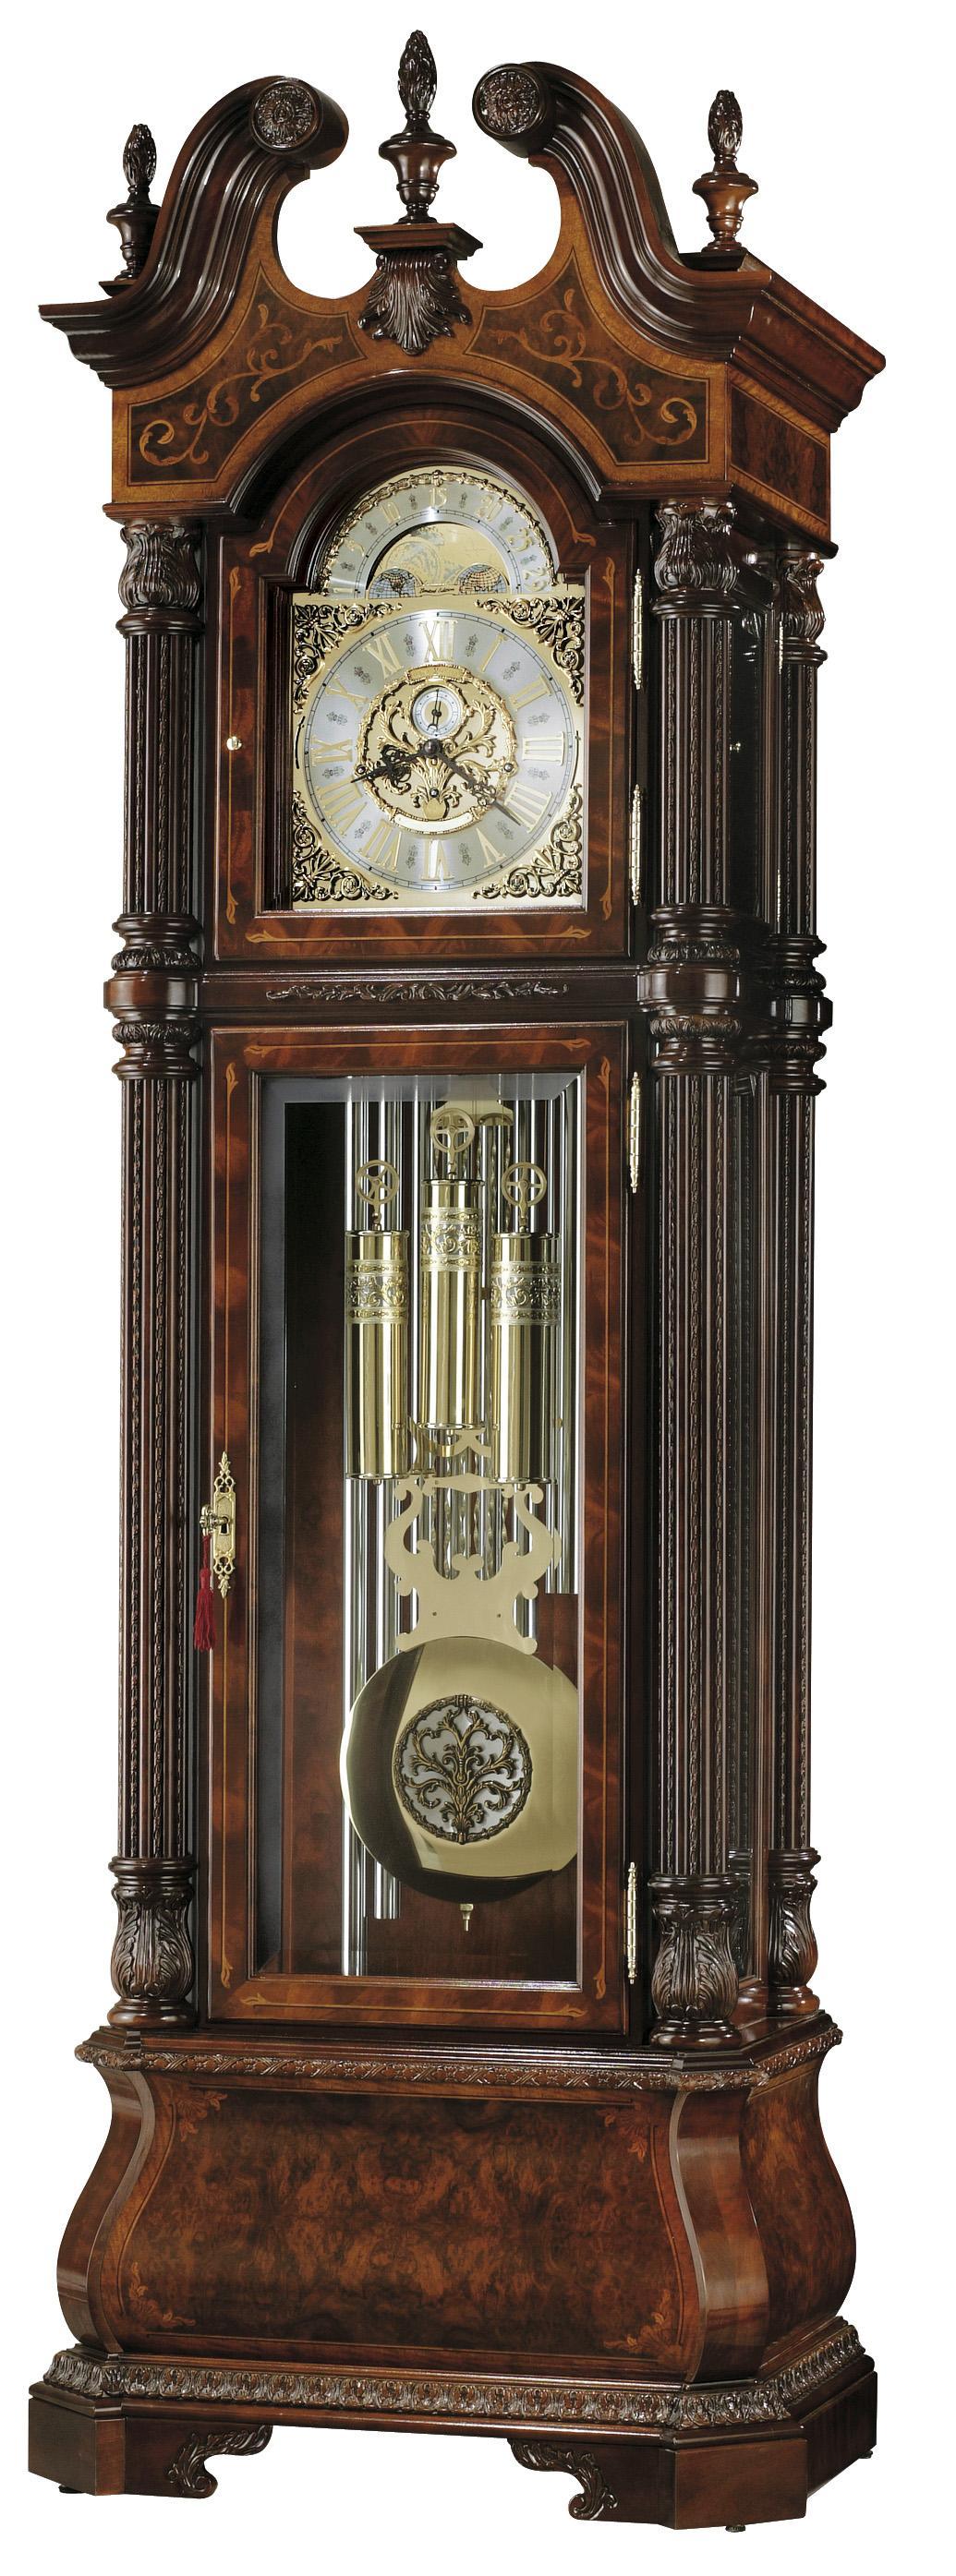 Howard Miller Clocks J.H. Miller II Grandfather Clock - Item Number: 611-031